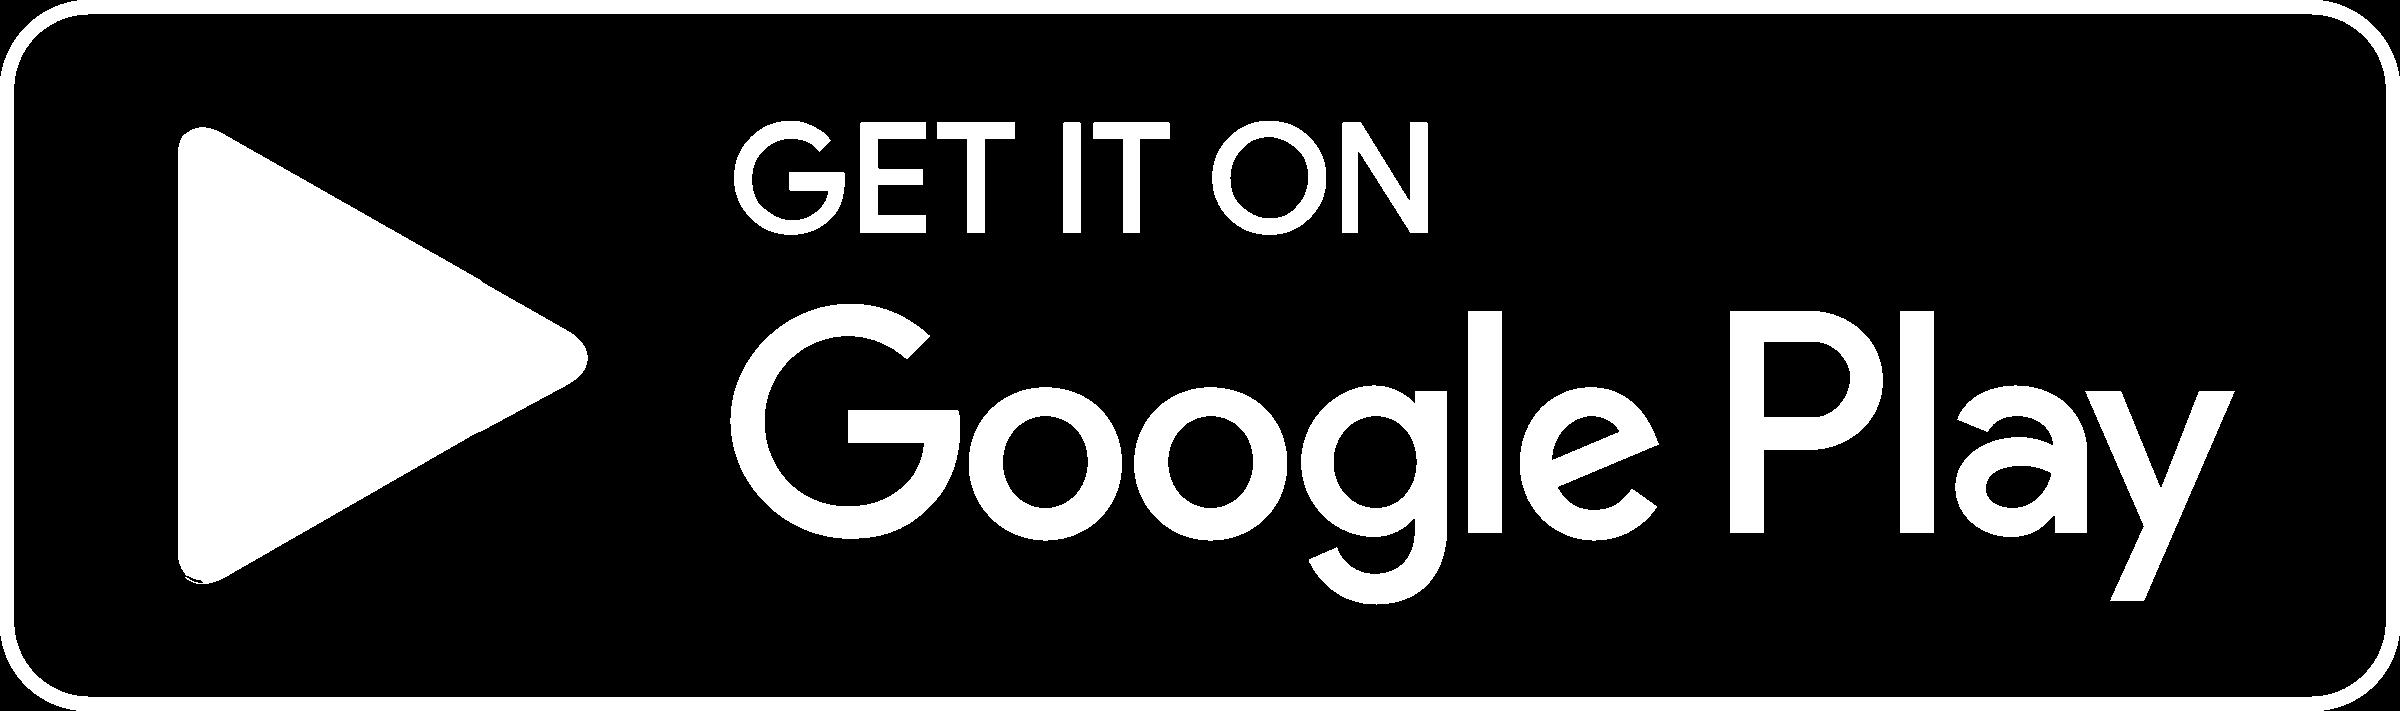 google-play-badge-logo-black-and-white.png